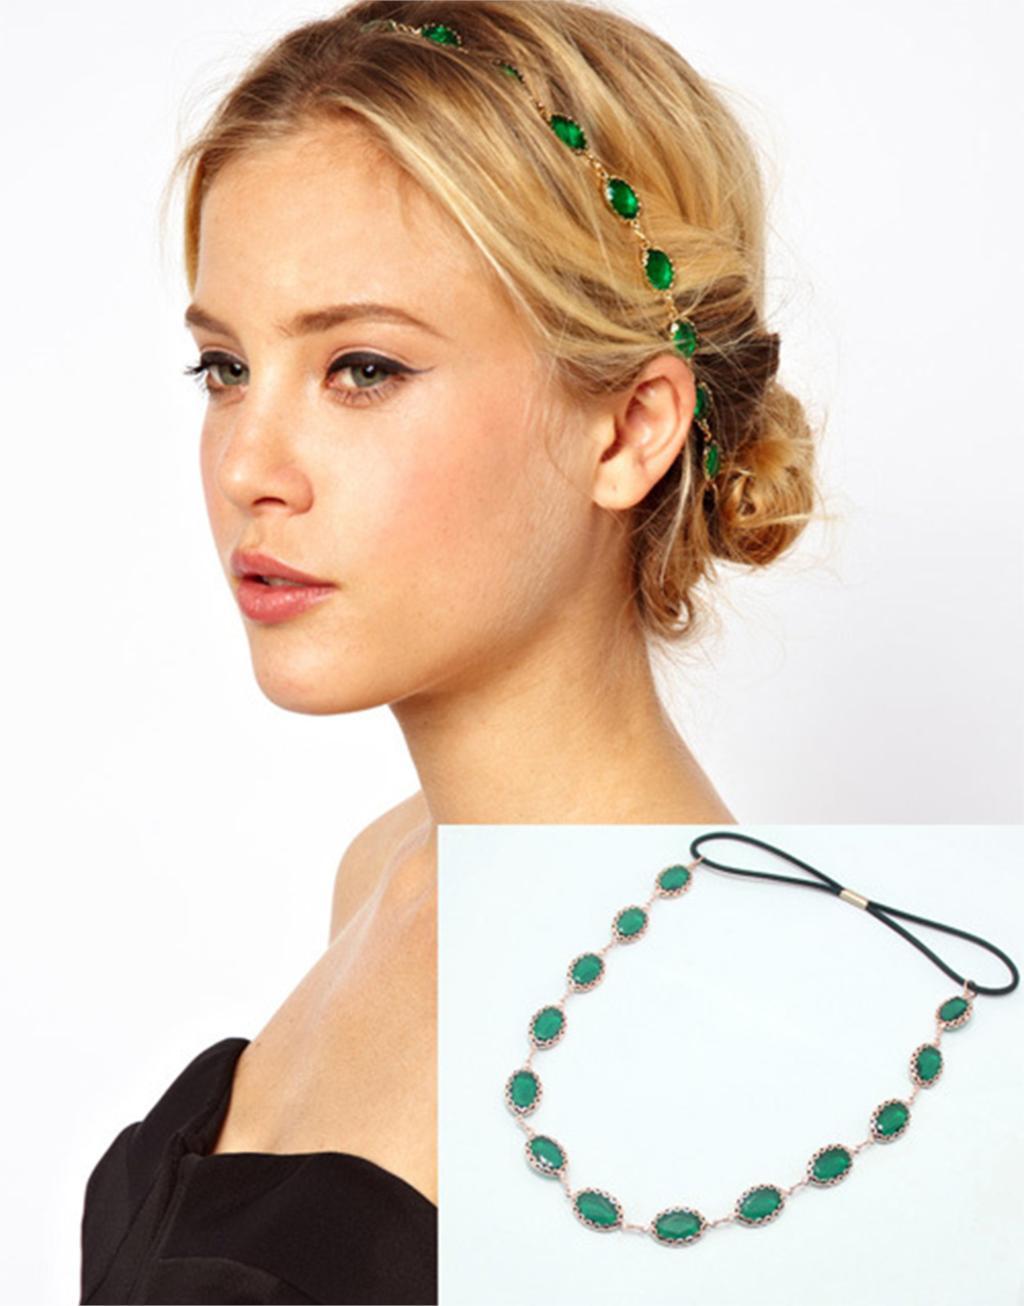 cheap-fine Fashion Oval Acrylic Fashion Lady Hair Band Headband New 2015 Women Hair Accessories(China (Mainland))